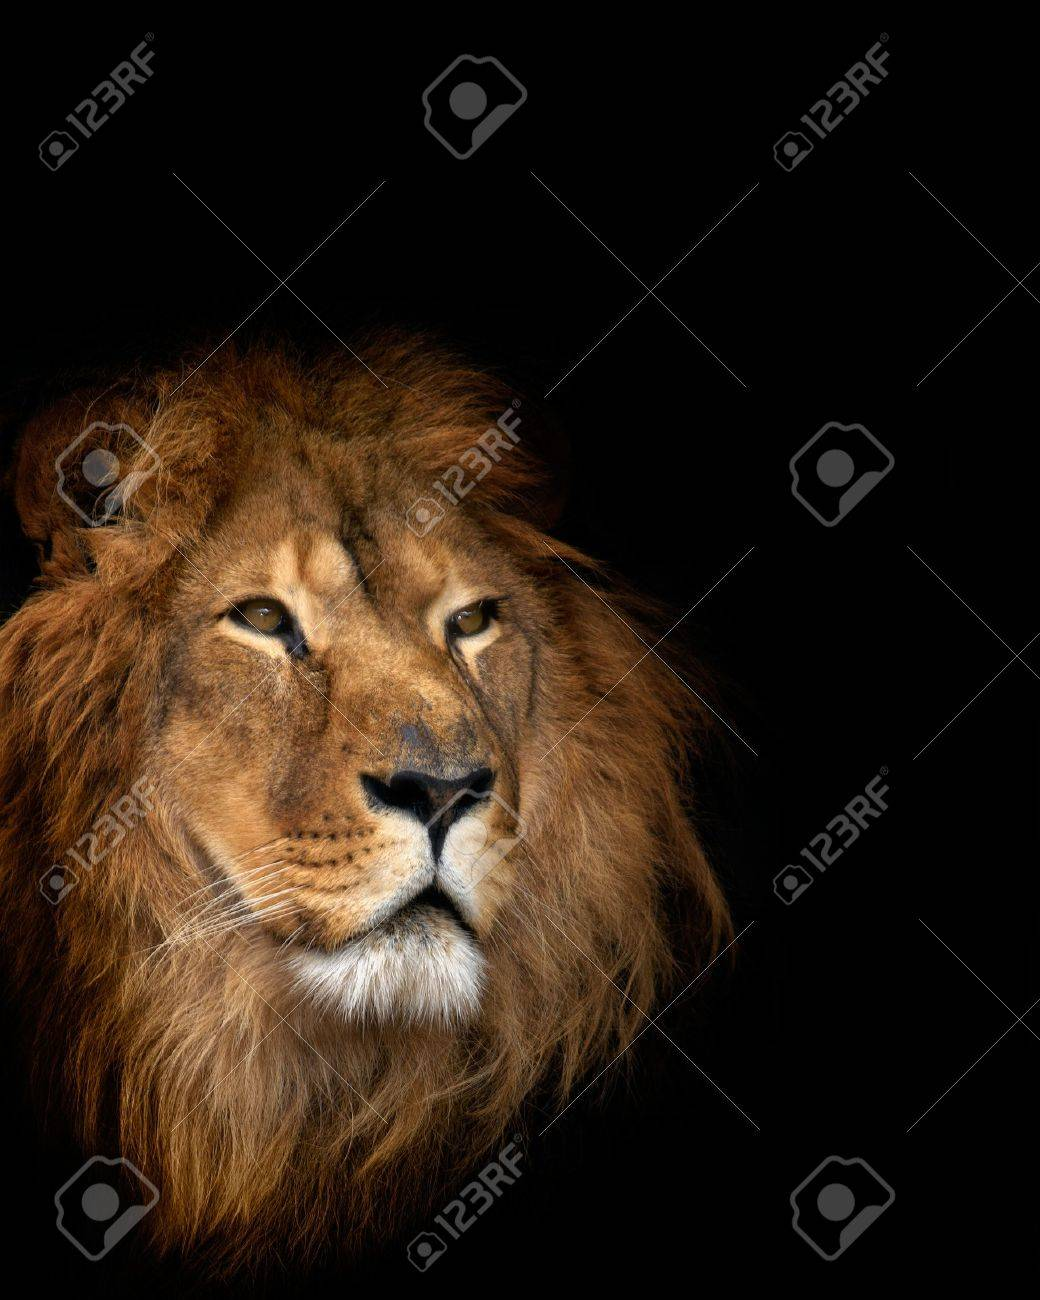 noble lion on a black background Stock Photo - 10611224